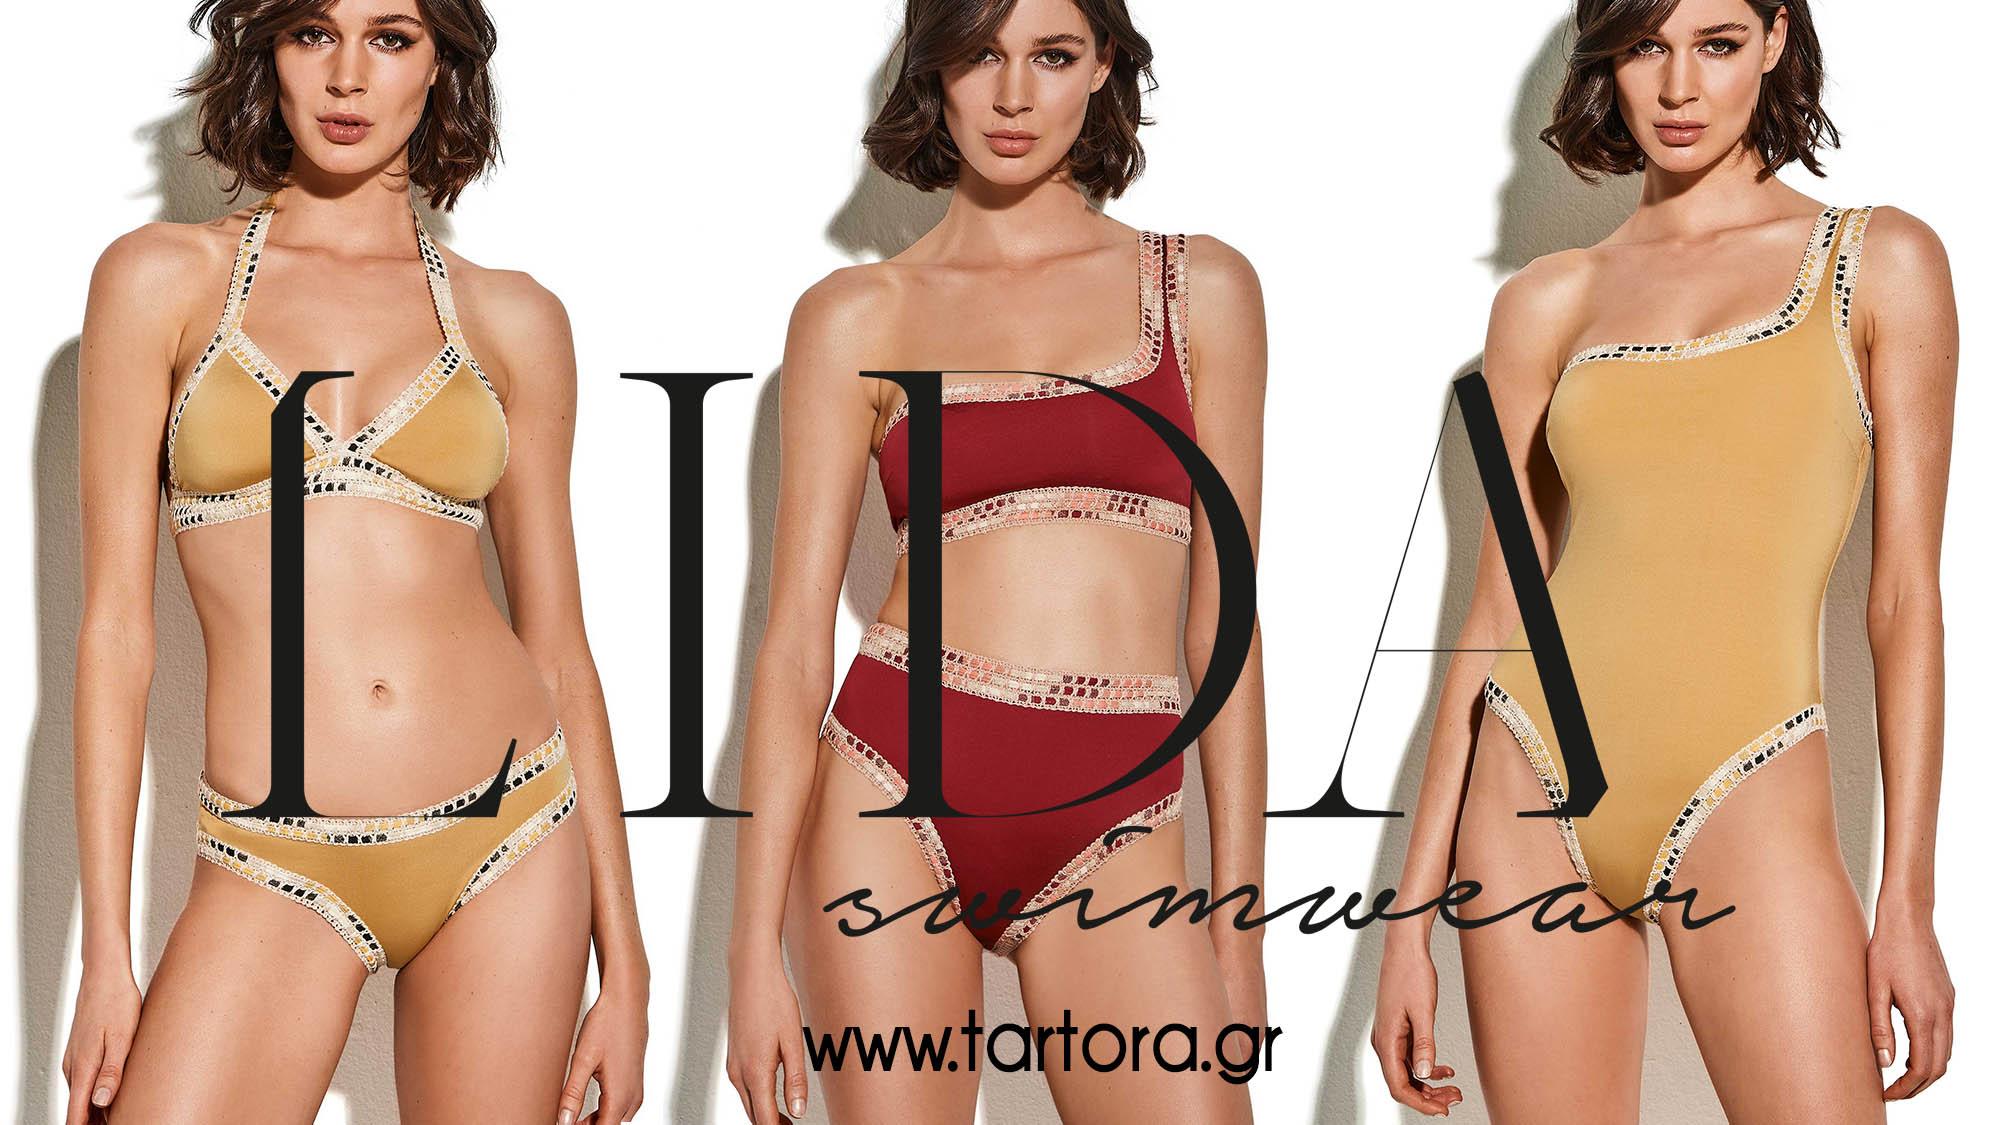 Lida lingerie εσώρουχα και μαγιό πολυτελείας